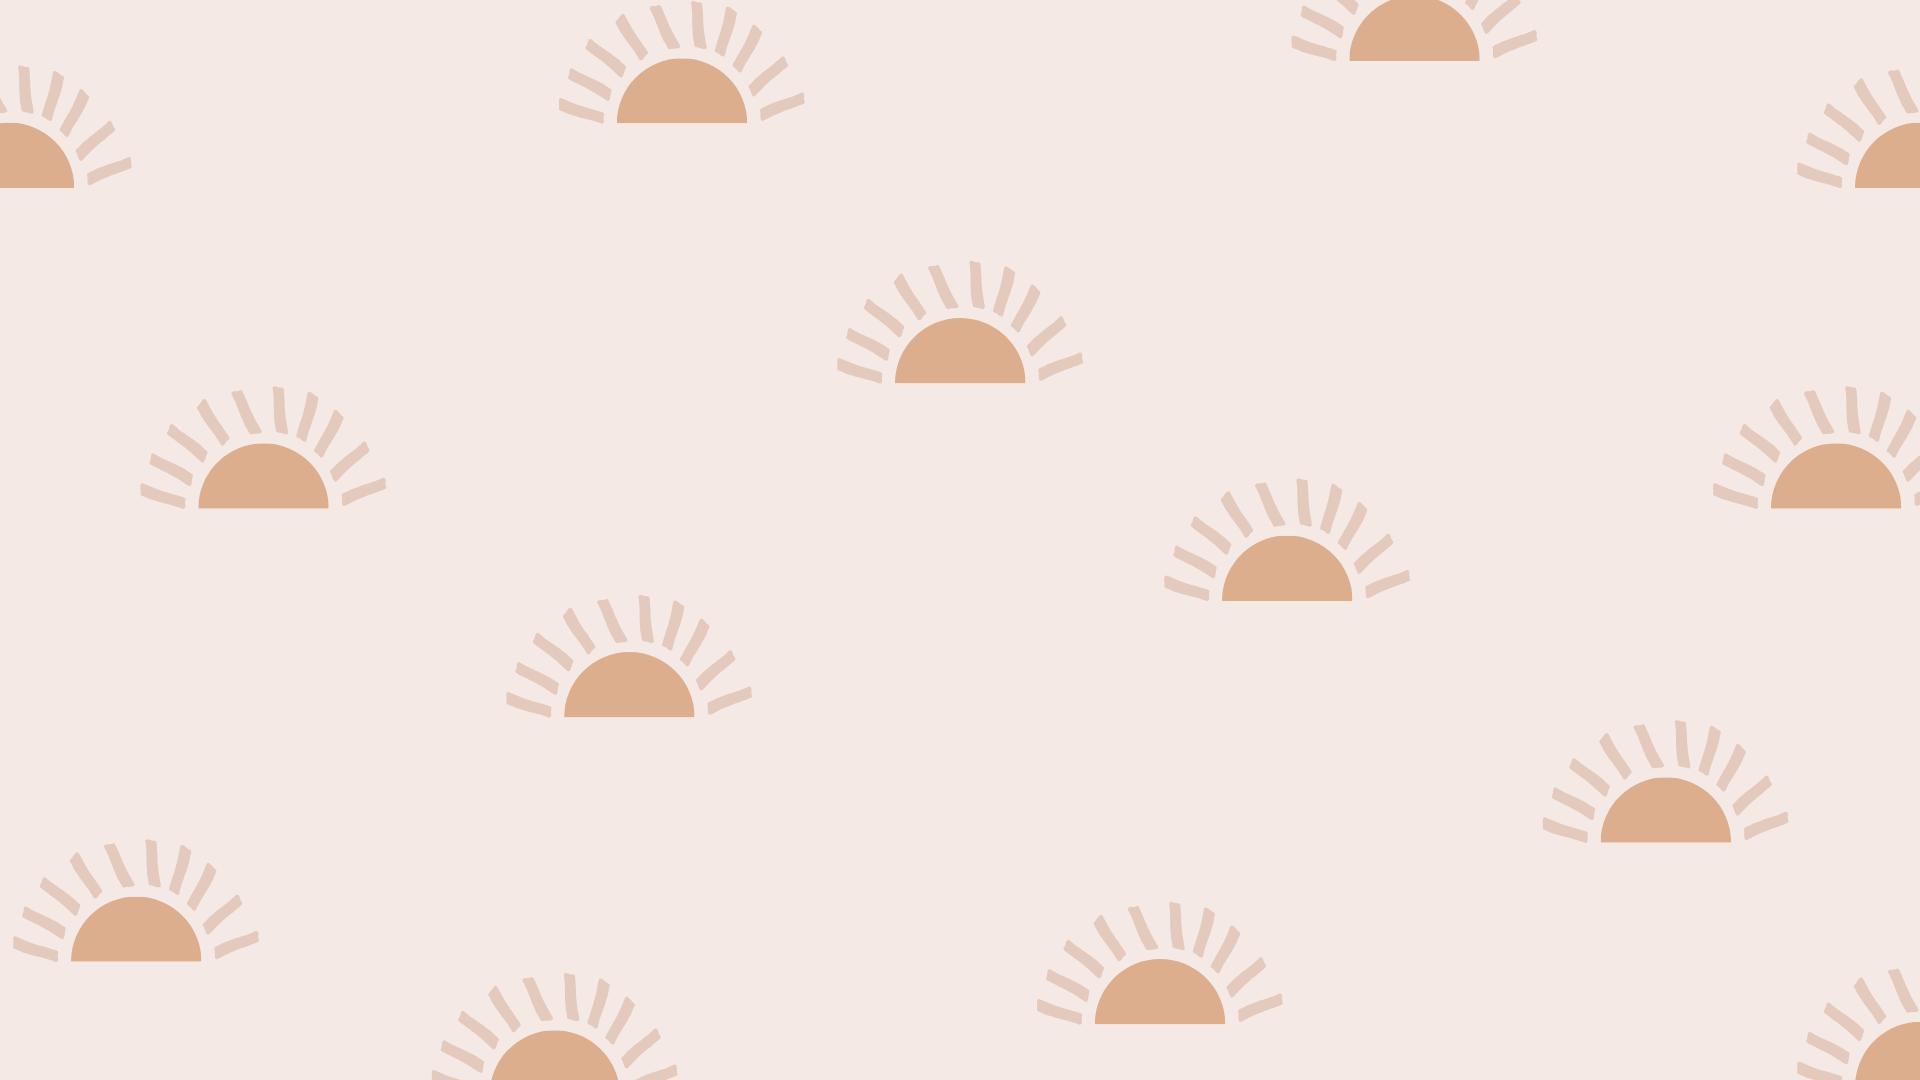 Pin By Midge On Aesthetic Laptop Wallpaper Desktop Wallpapers Cute Desktop Wallpaper Aesthetic Desktop Wallpaper